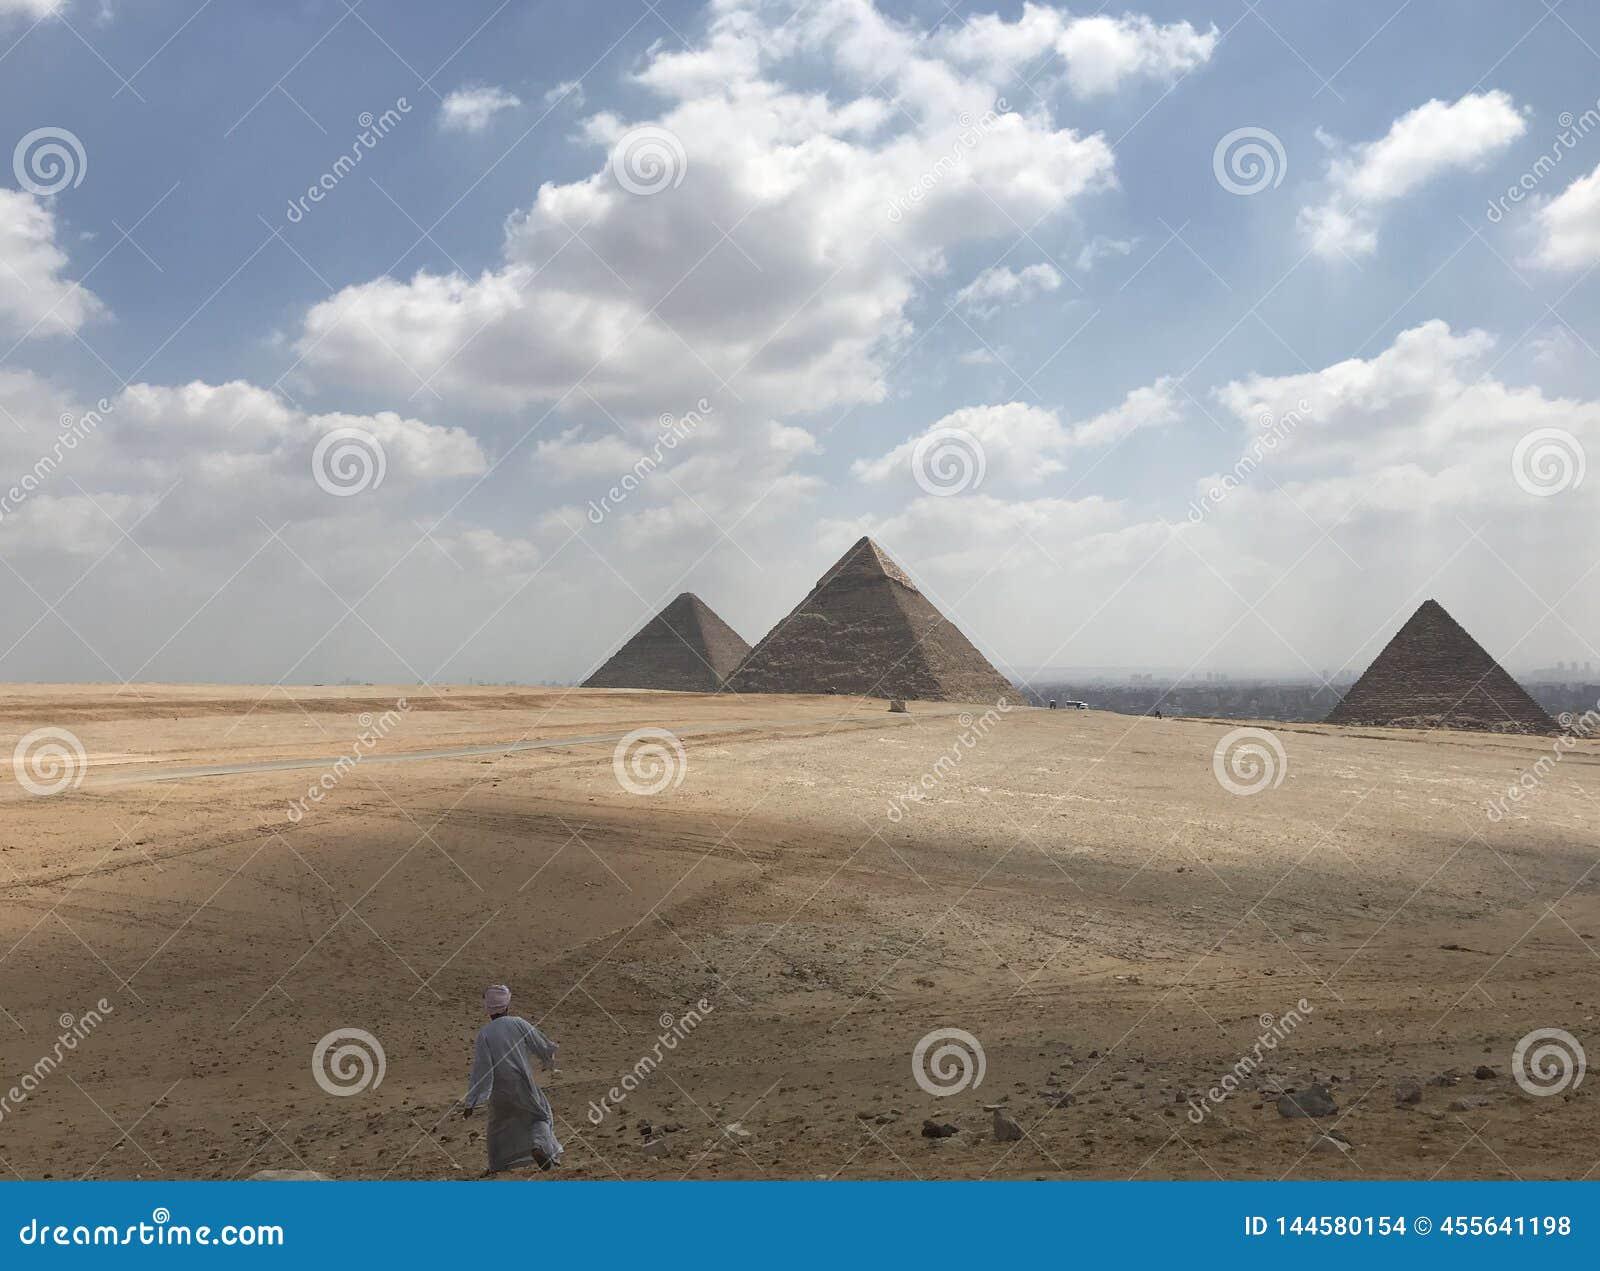 Man and the Pyramid